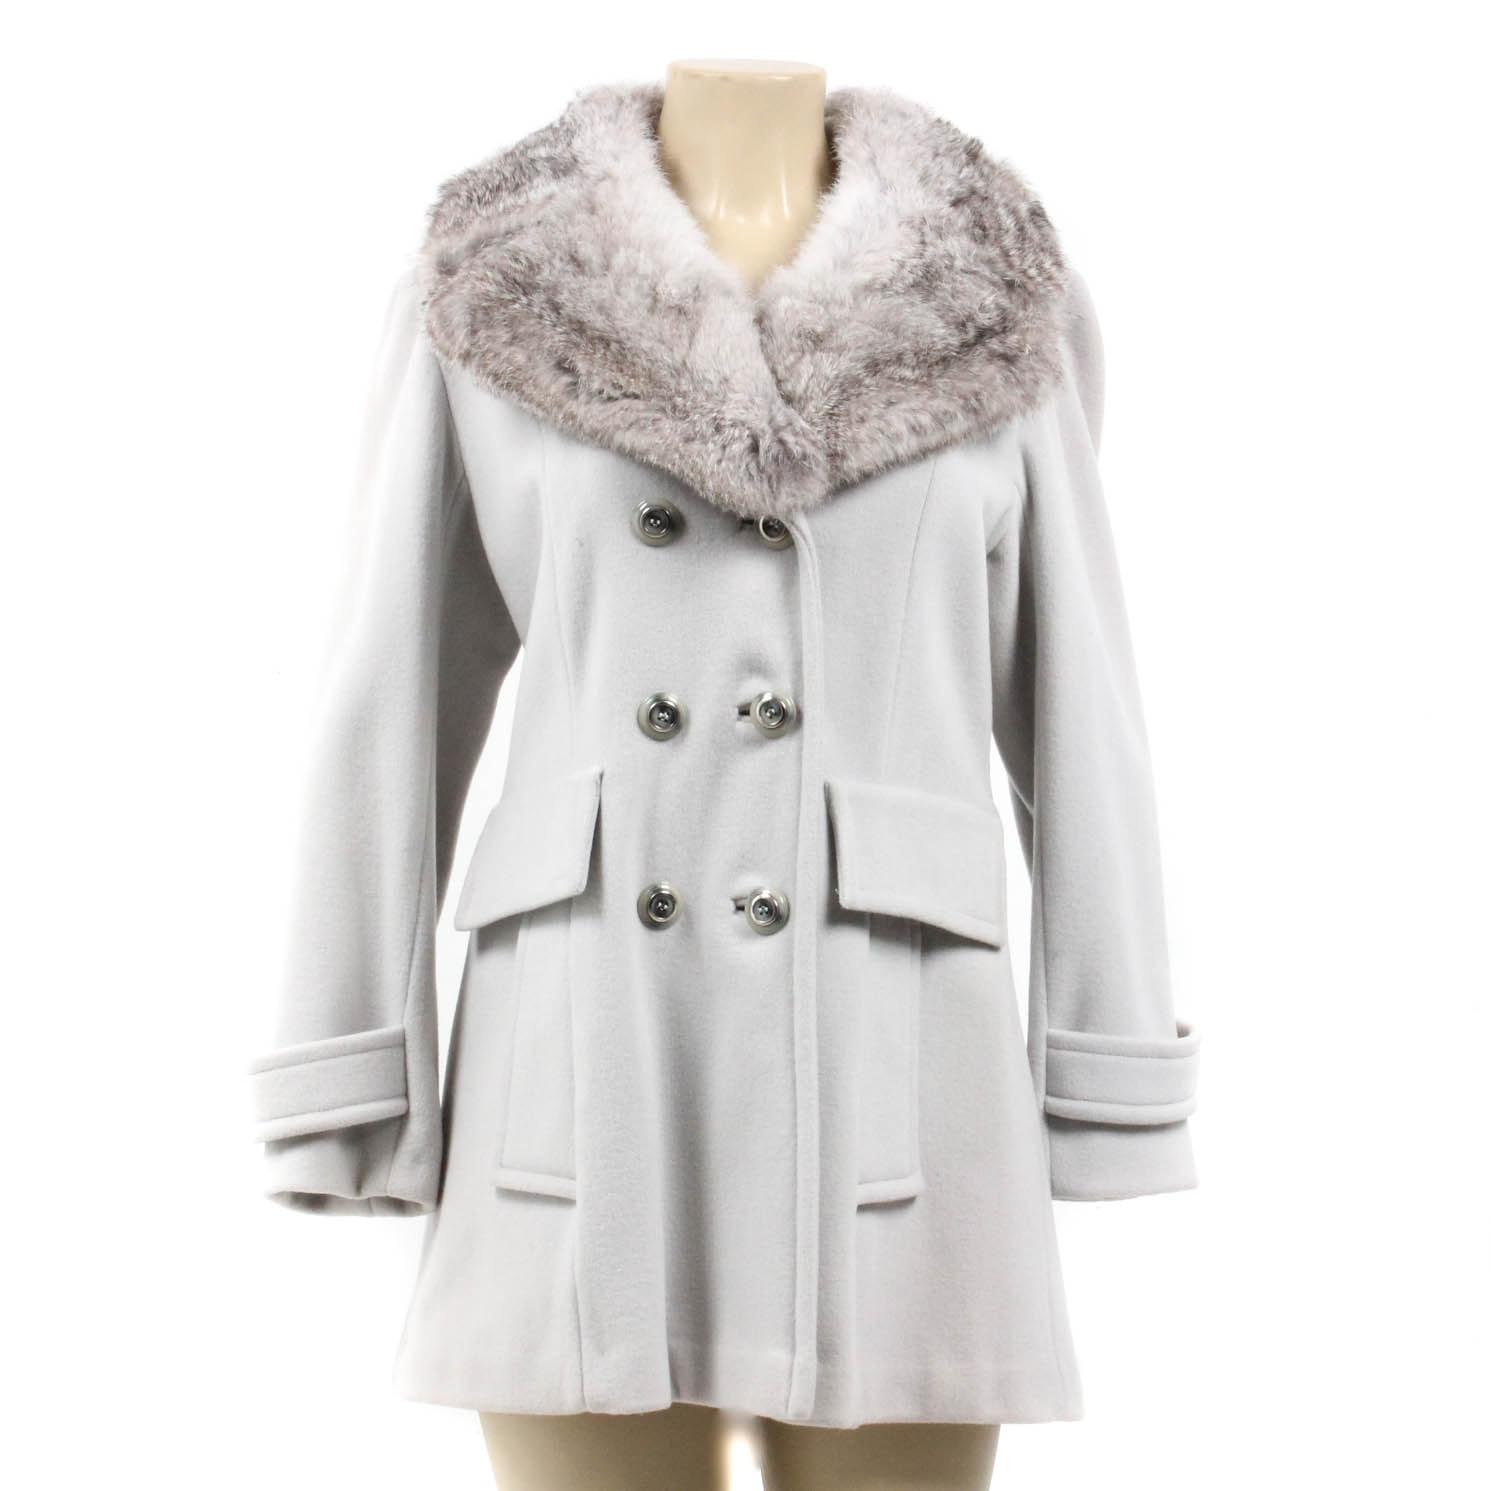 Vintage Sears Gray Wool Coat With Rabbit Fur Collar